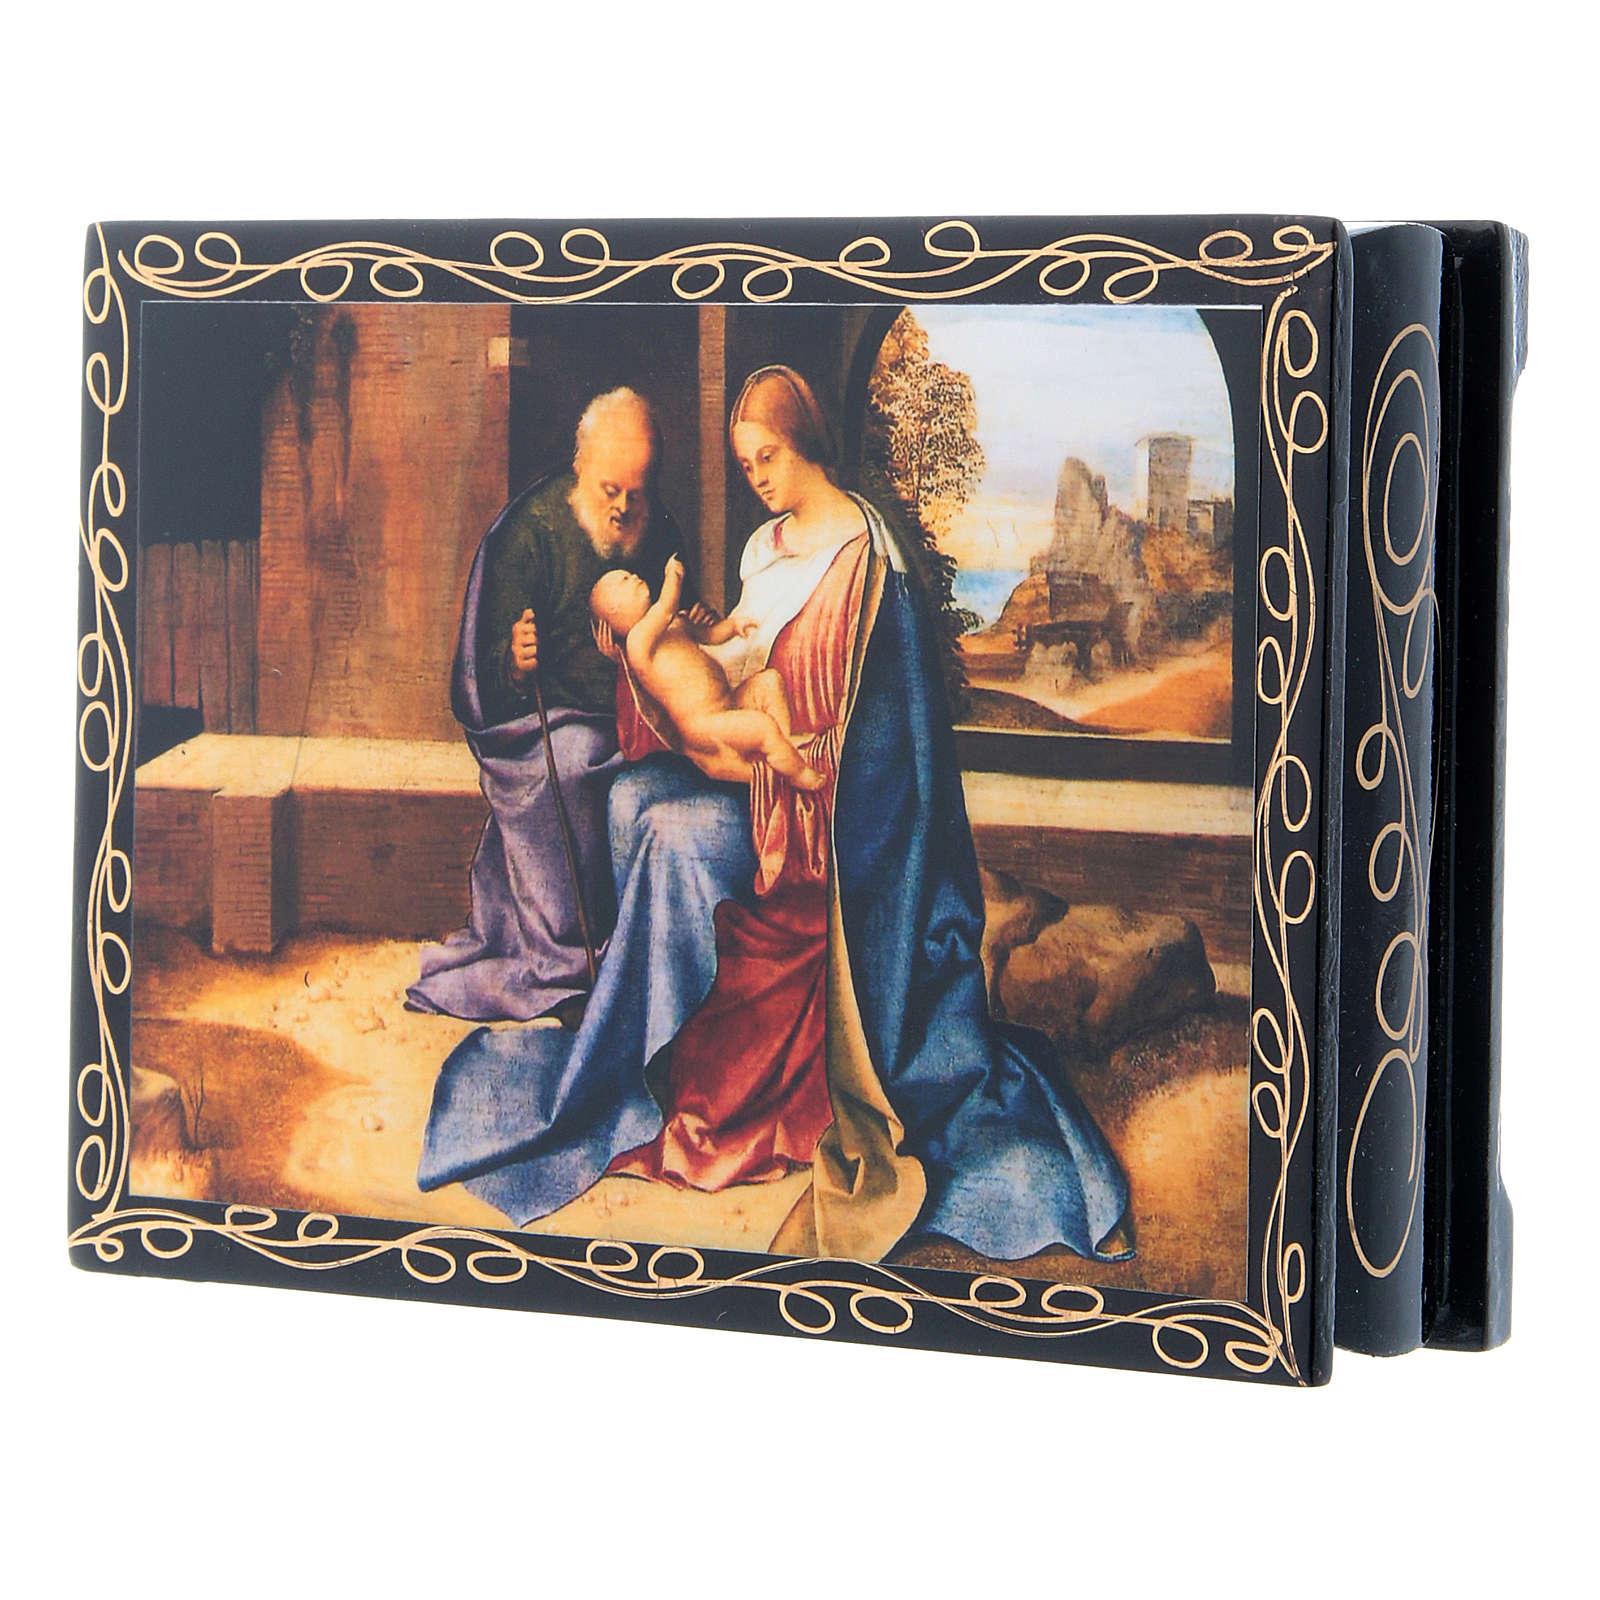 Russian papier-mâché and lacquer painted box The Nativity of Jesus 14x10 cm 4